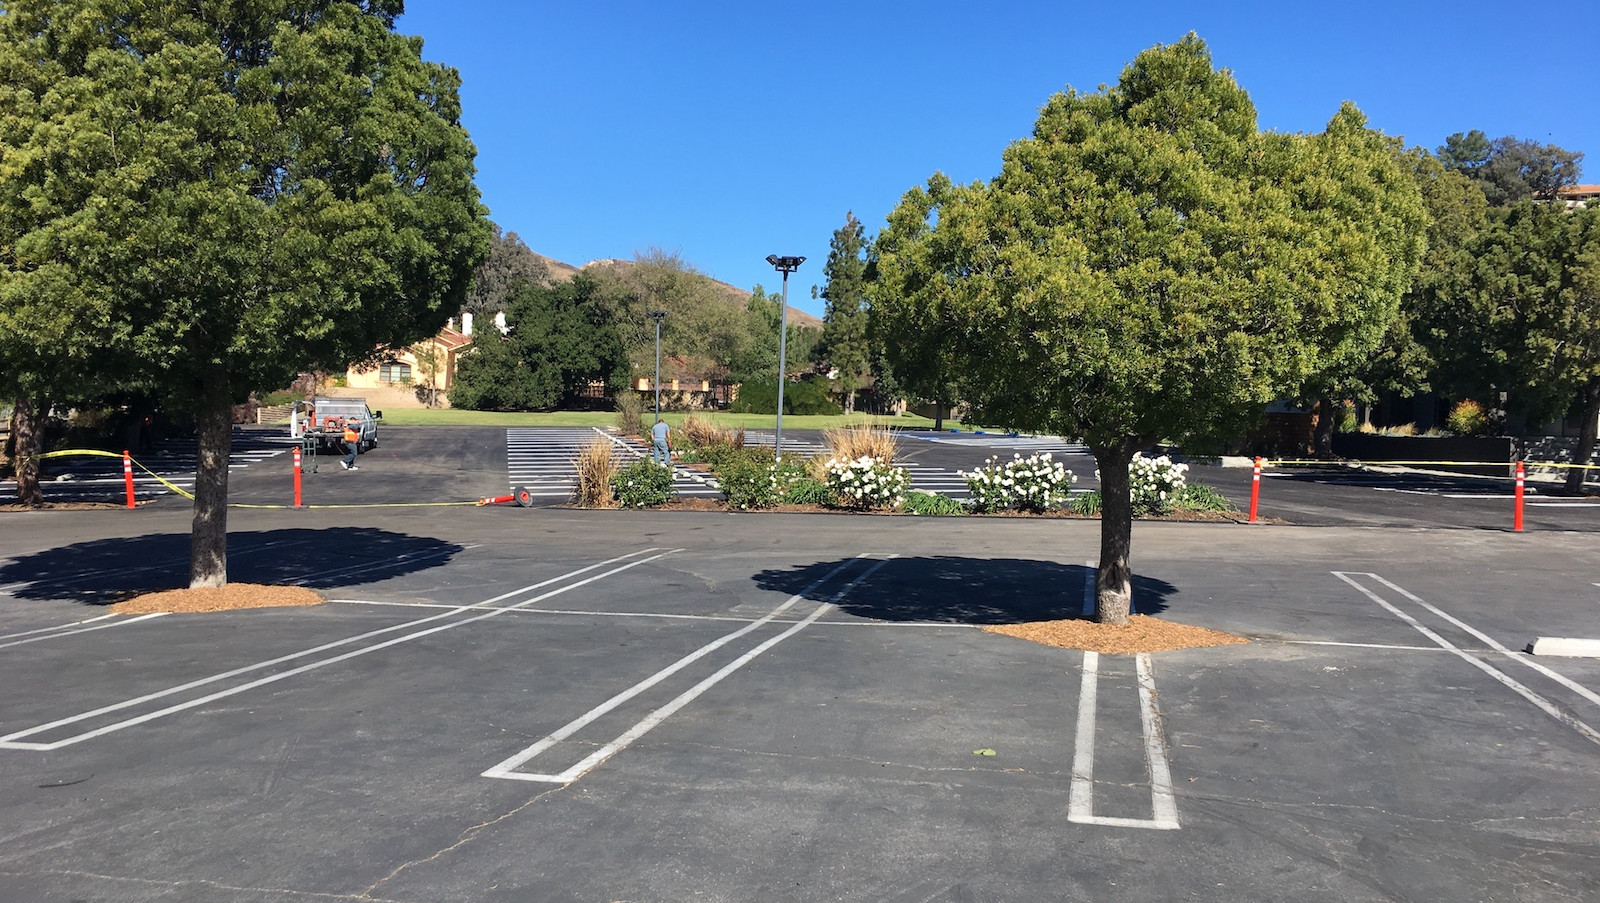 Parking Lot_2.JPG